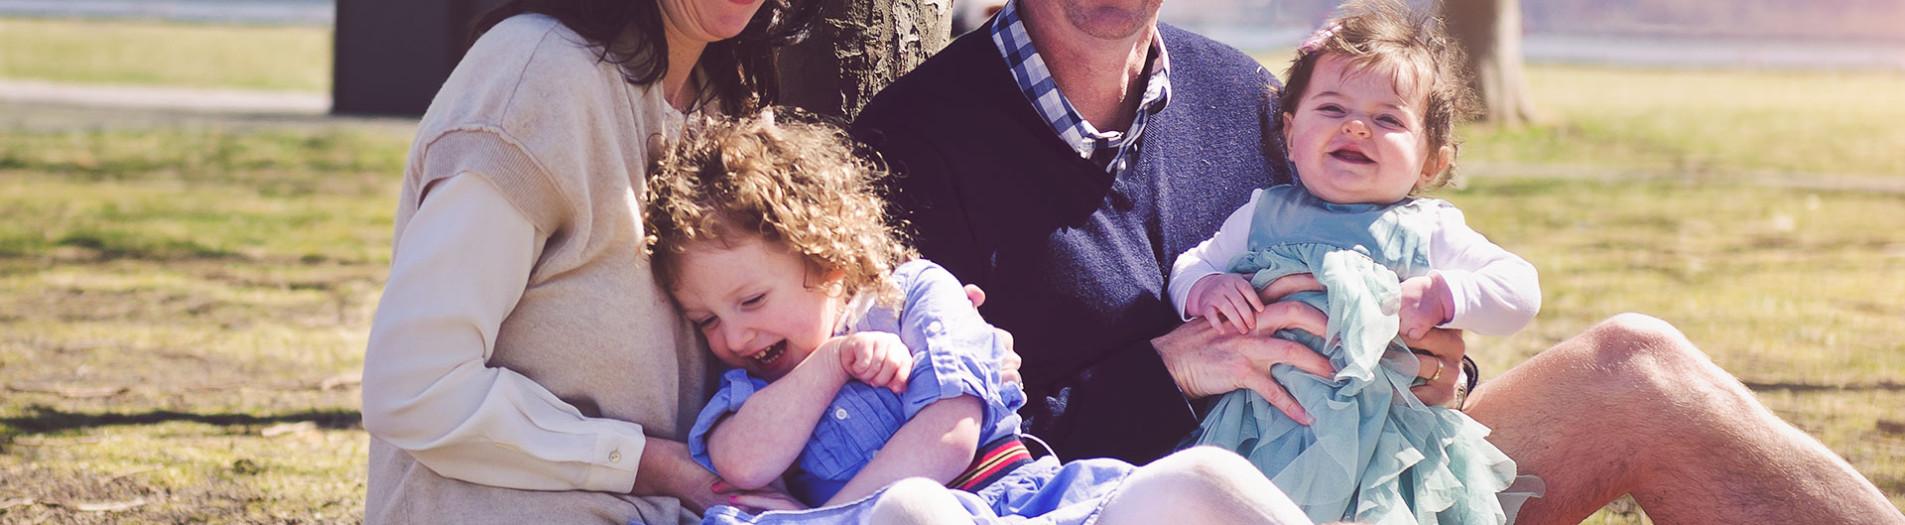 Wignell Family {Hoboken, Jersey City, Family Photographer}